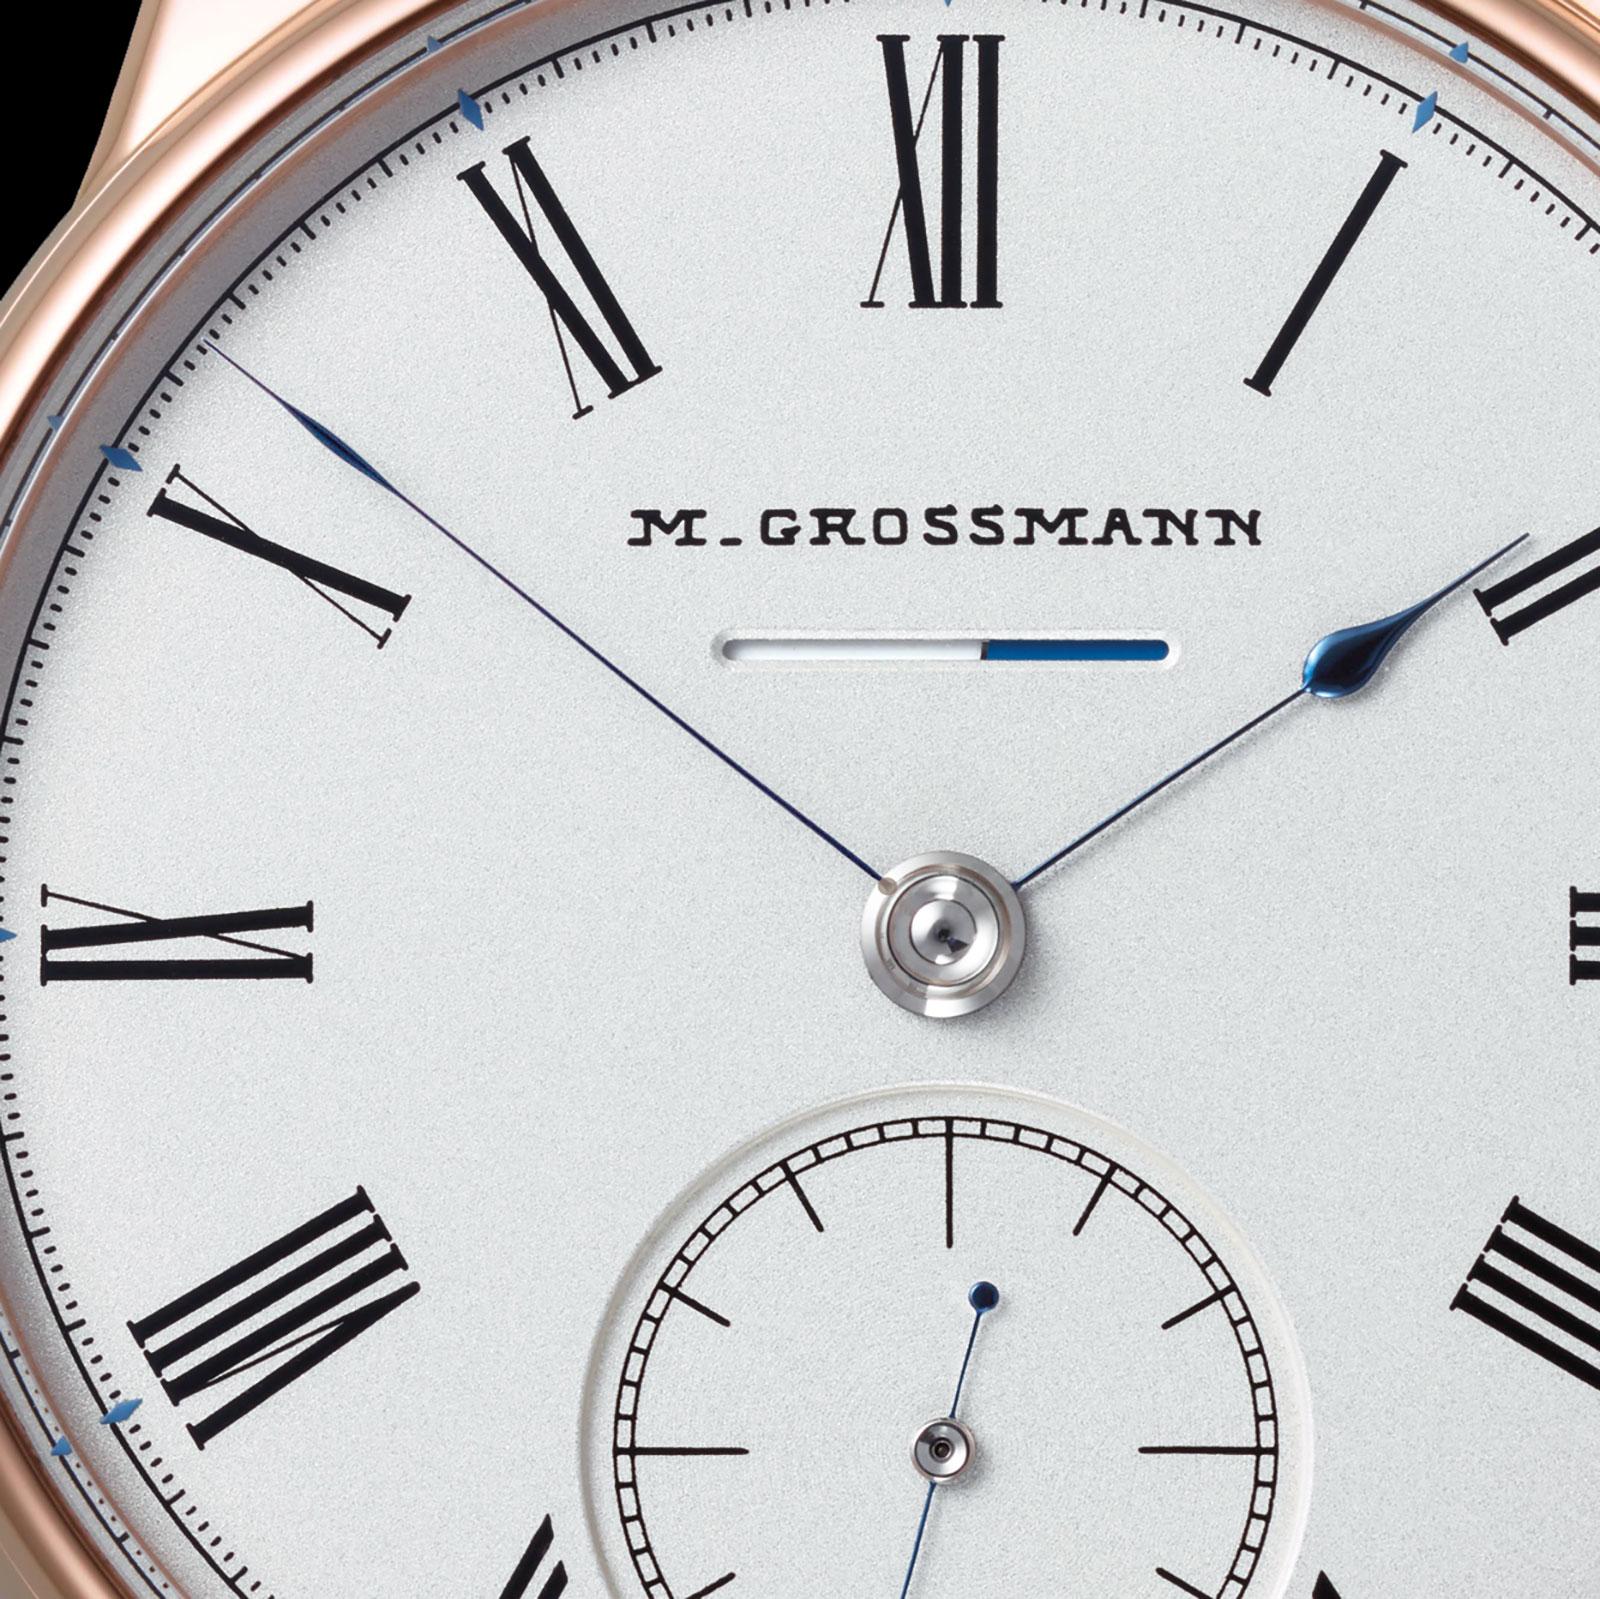 moritz grossmann power reserve vintage 2